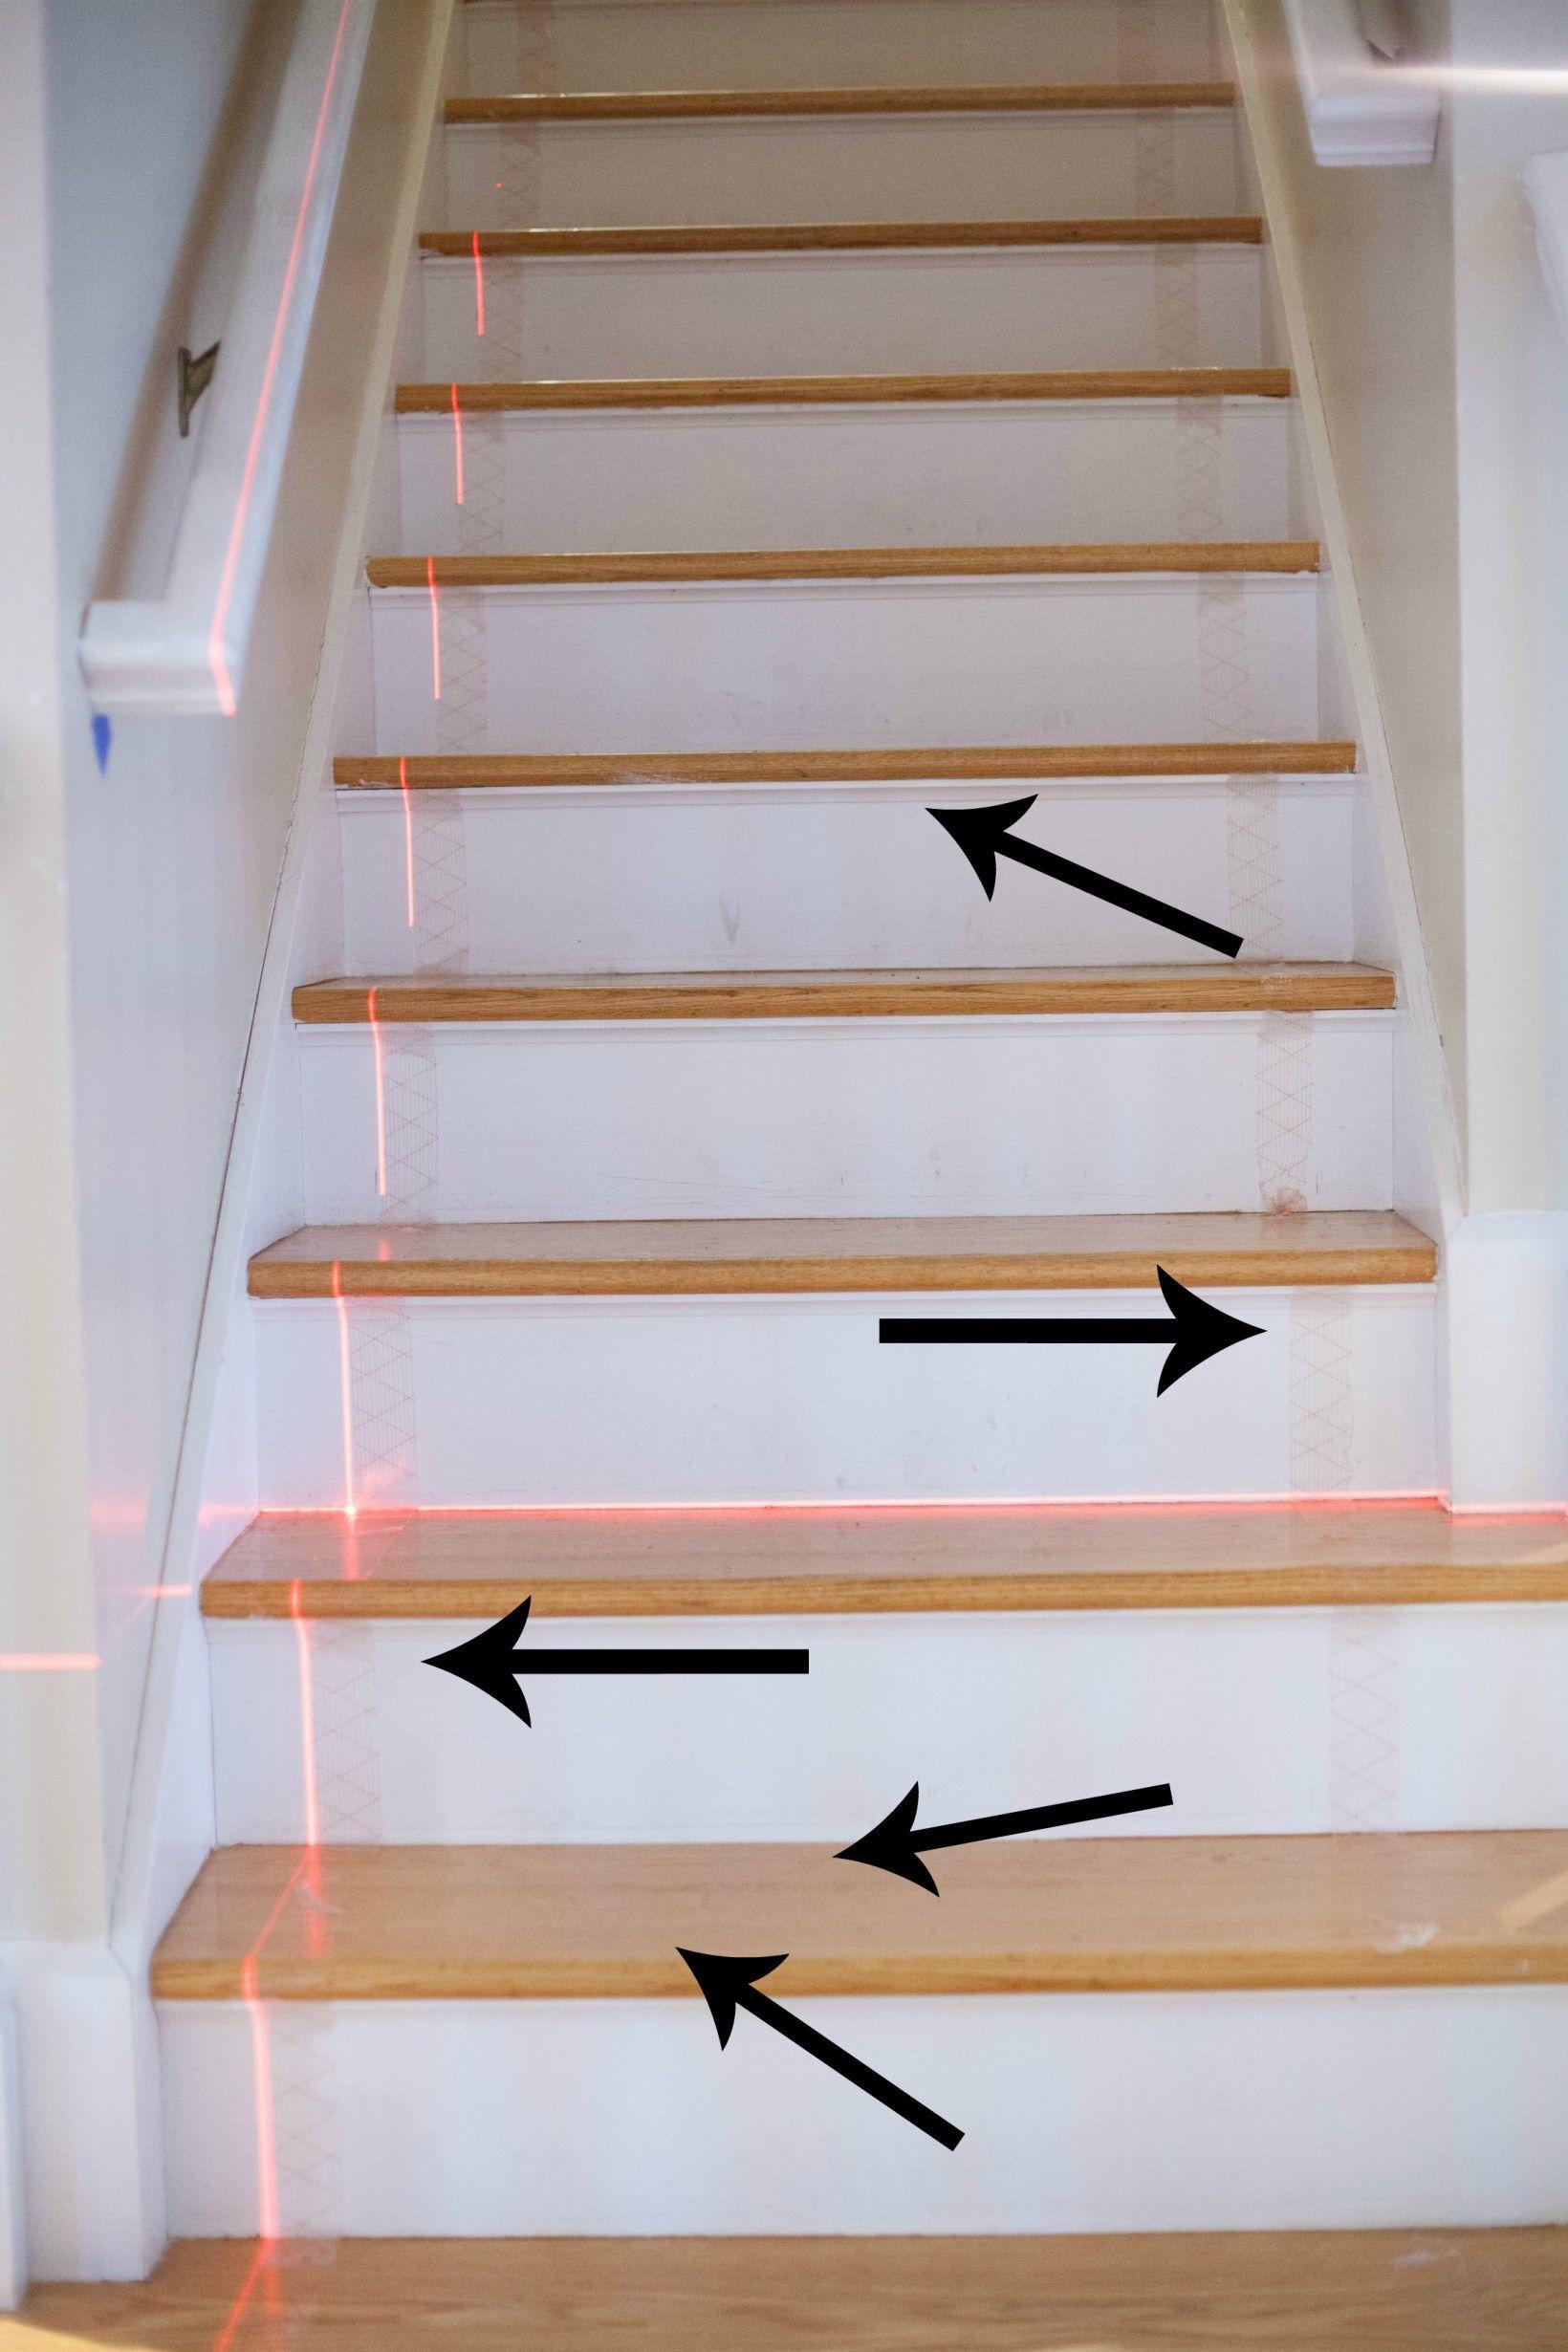 Best Home Diy Stair Runner Diy Carpet Home Improvement 400 x 300